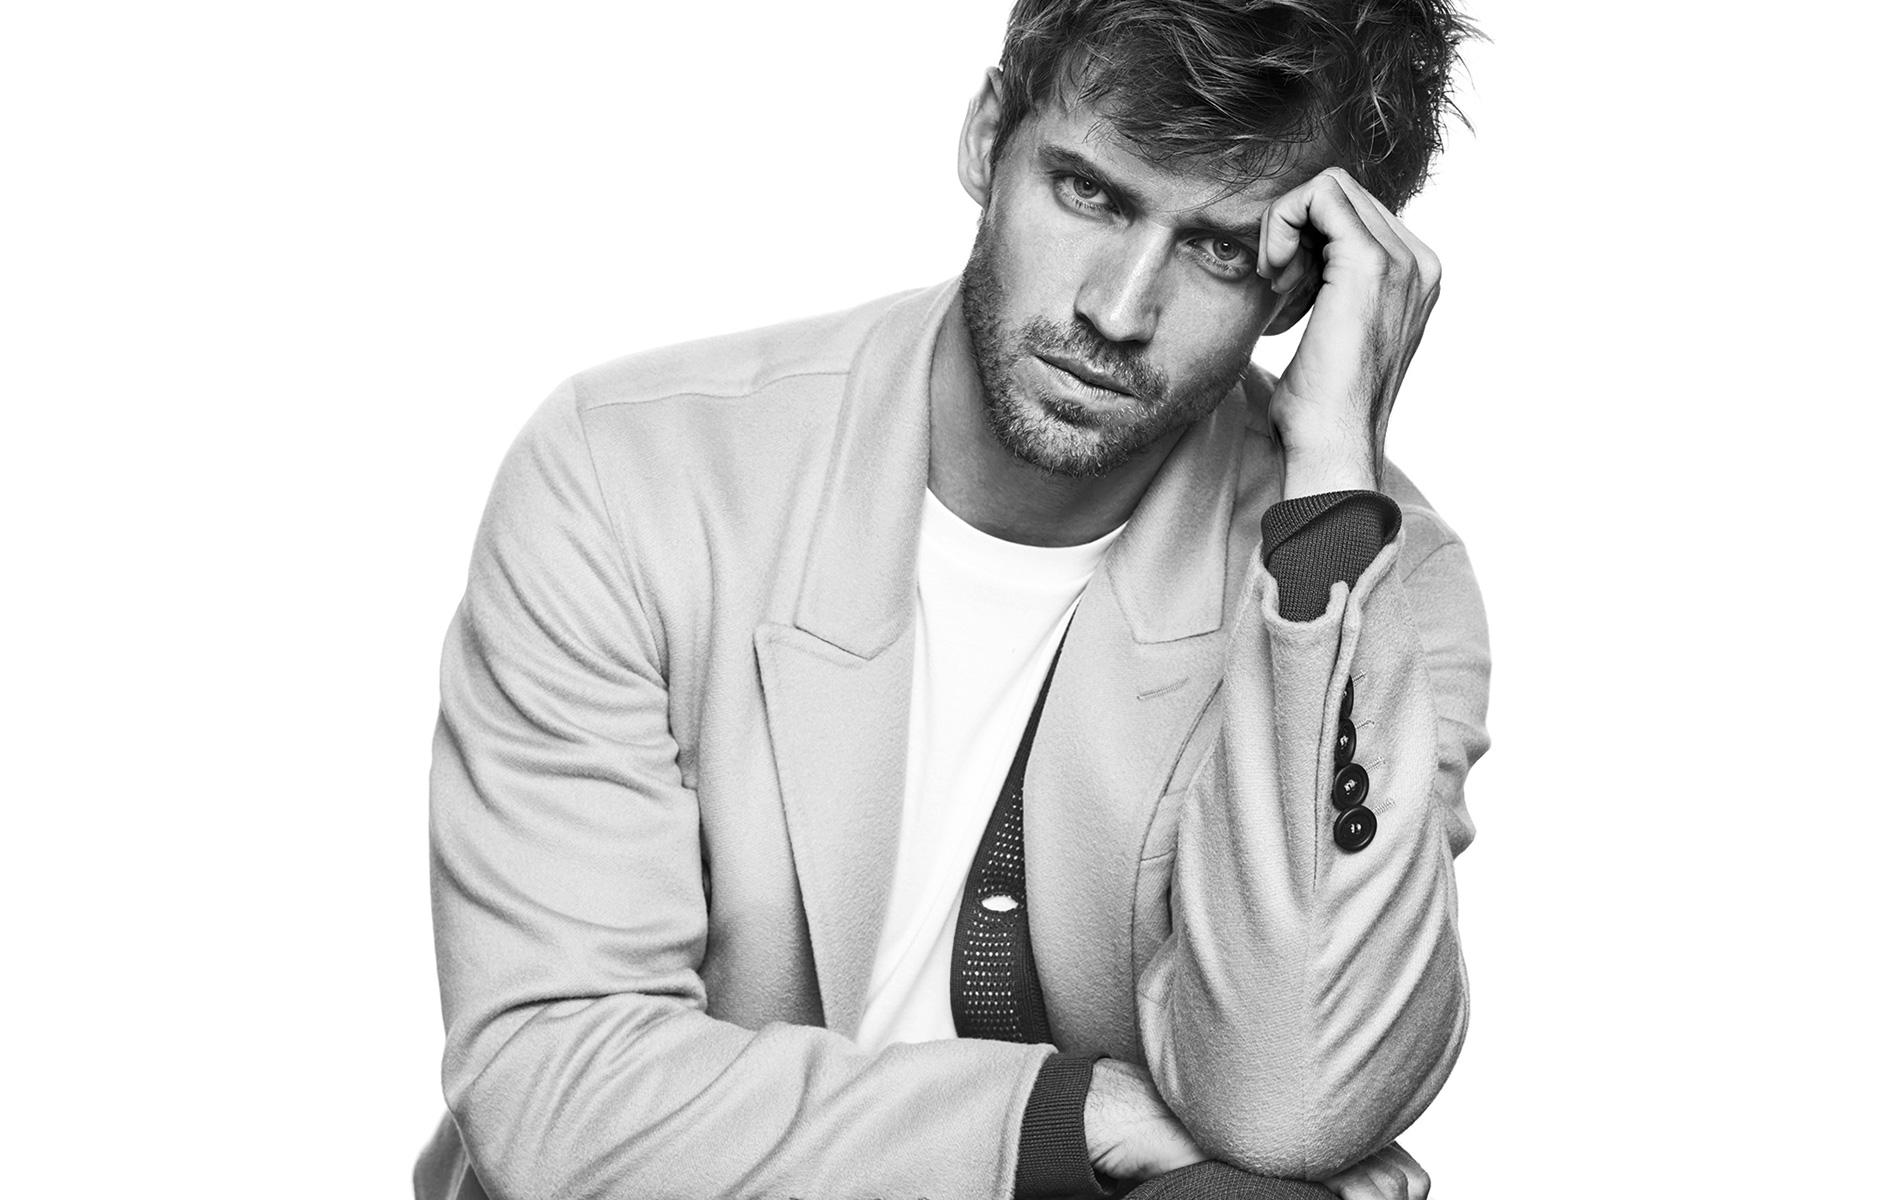 Andrew Cooper, Sam Webb + More Models Star in L'Optimum Shoot